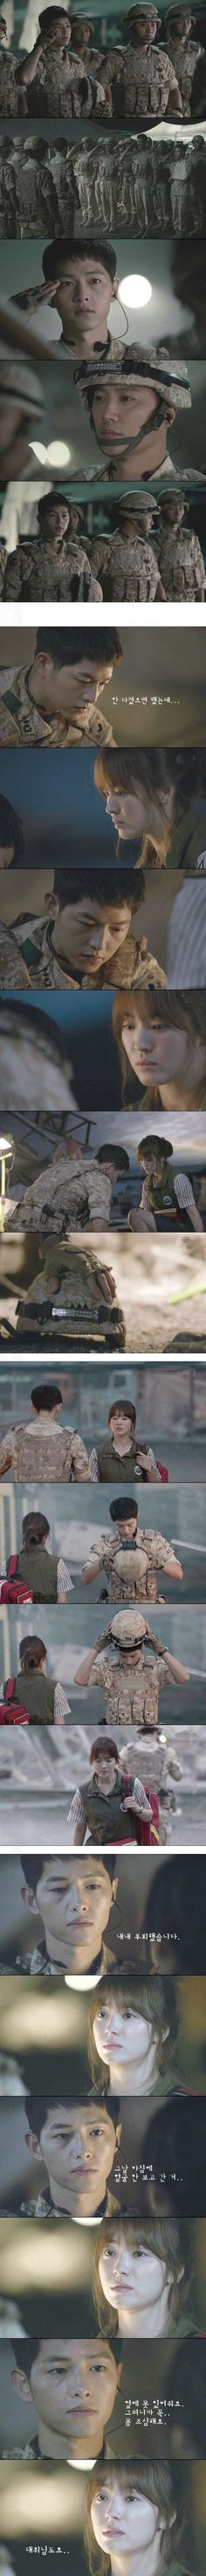 Descendants of the Sun (태양의 후예) Korean - Drama - Episode 7 - Picture @ HanCinema :: The Korean Movie and Drama Database